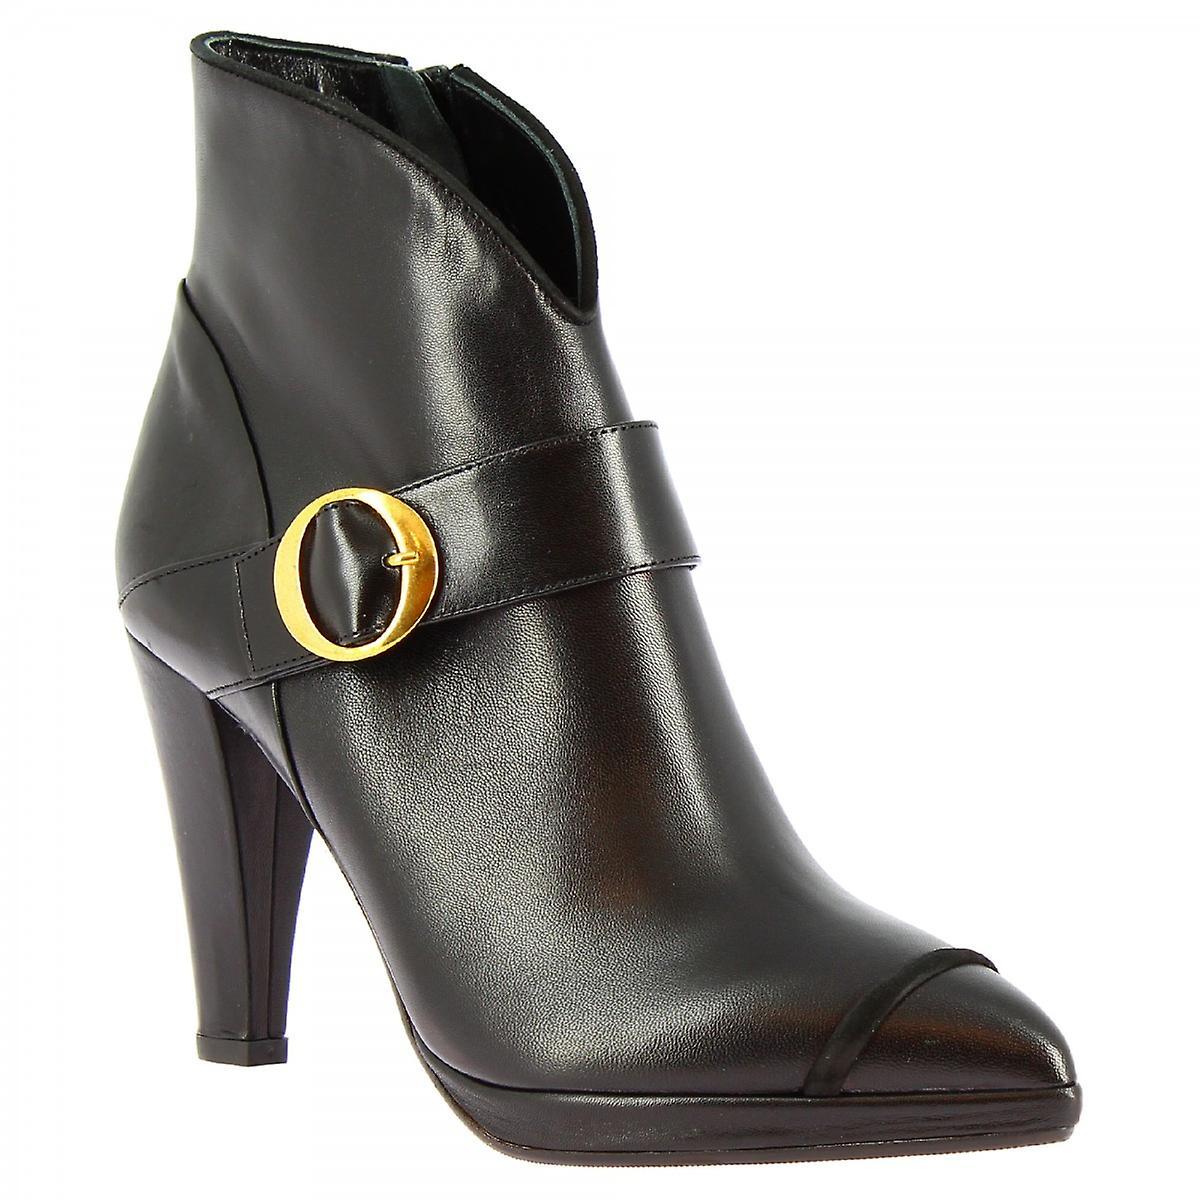 Leonardo Shoes Women's handmade heels pointy ankle boots in black napa leather ac0pB